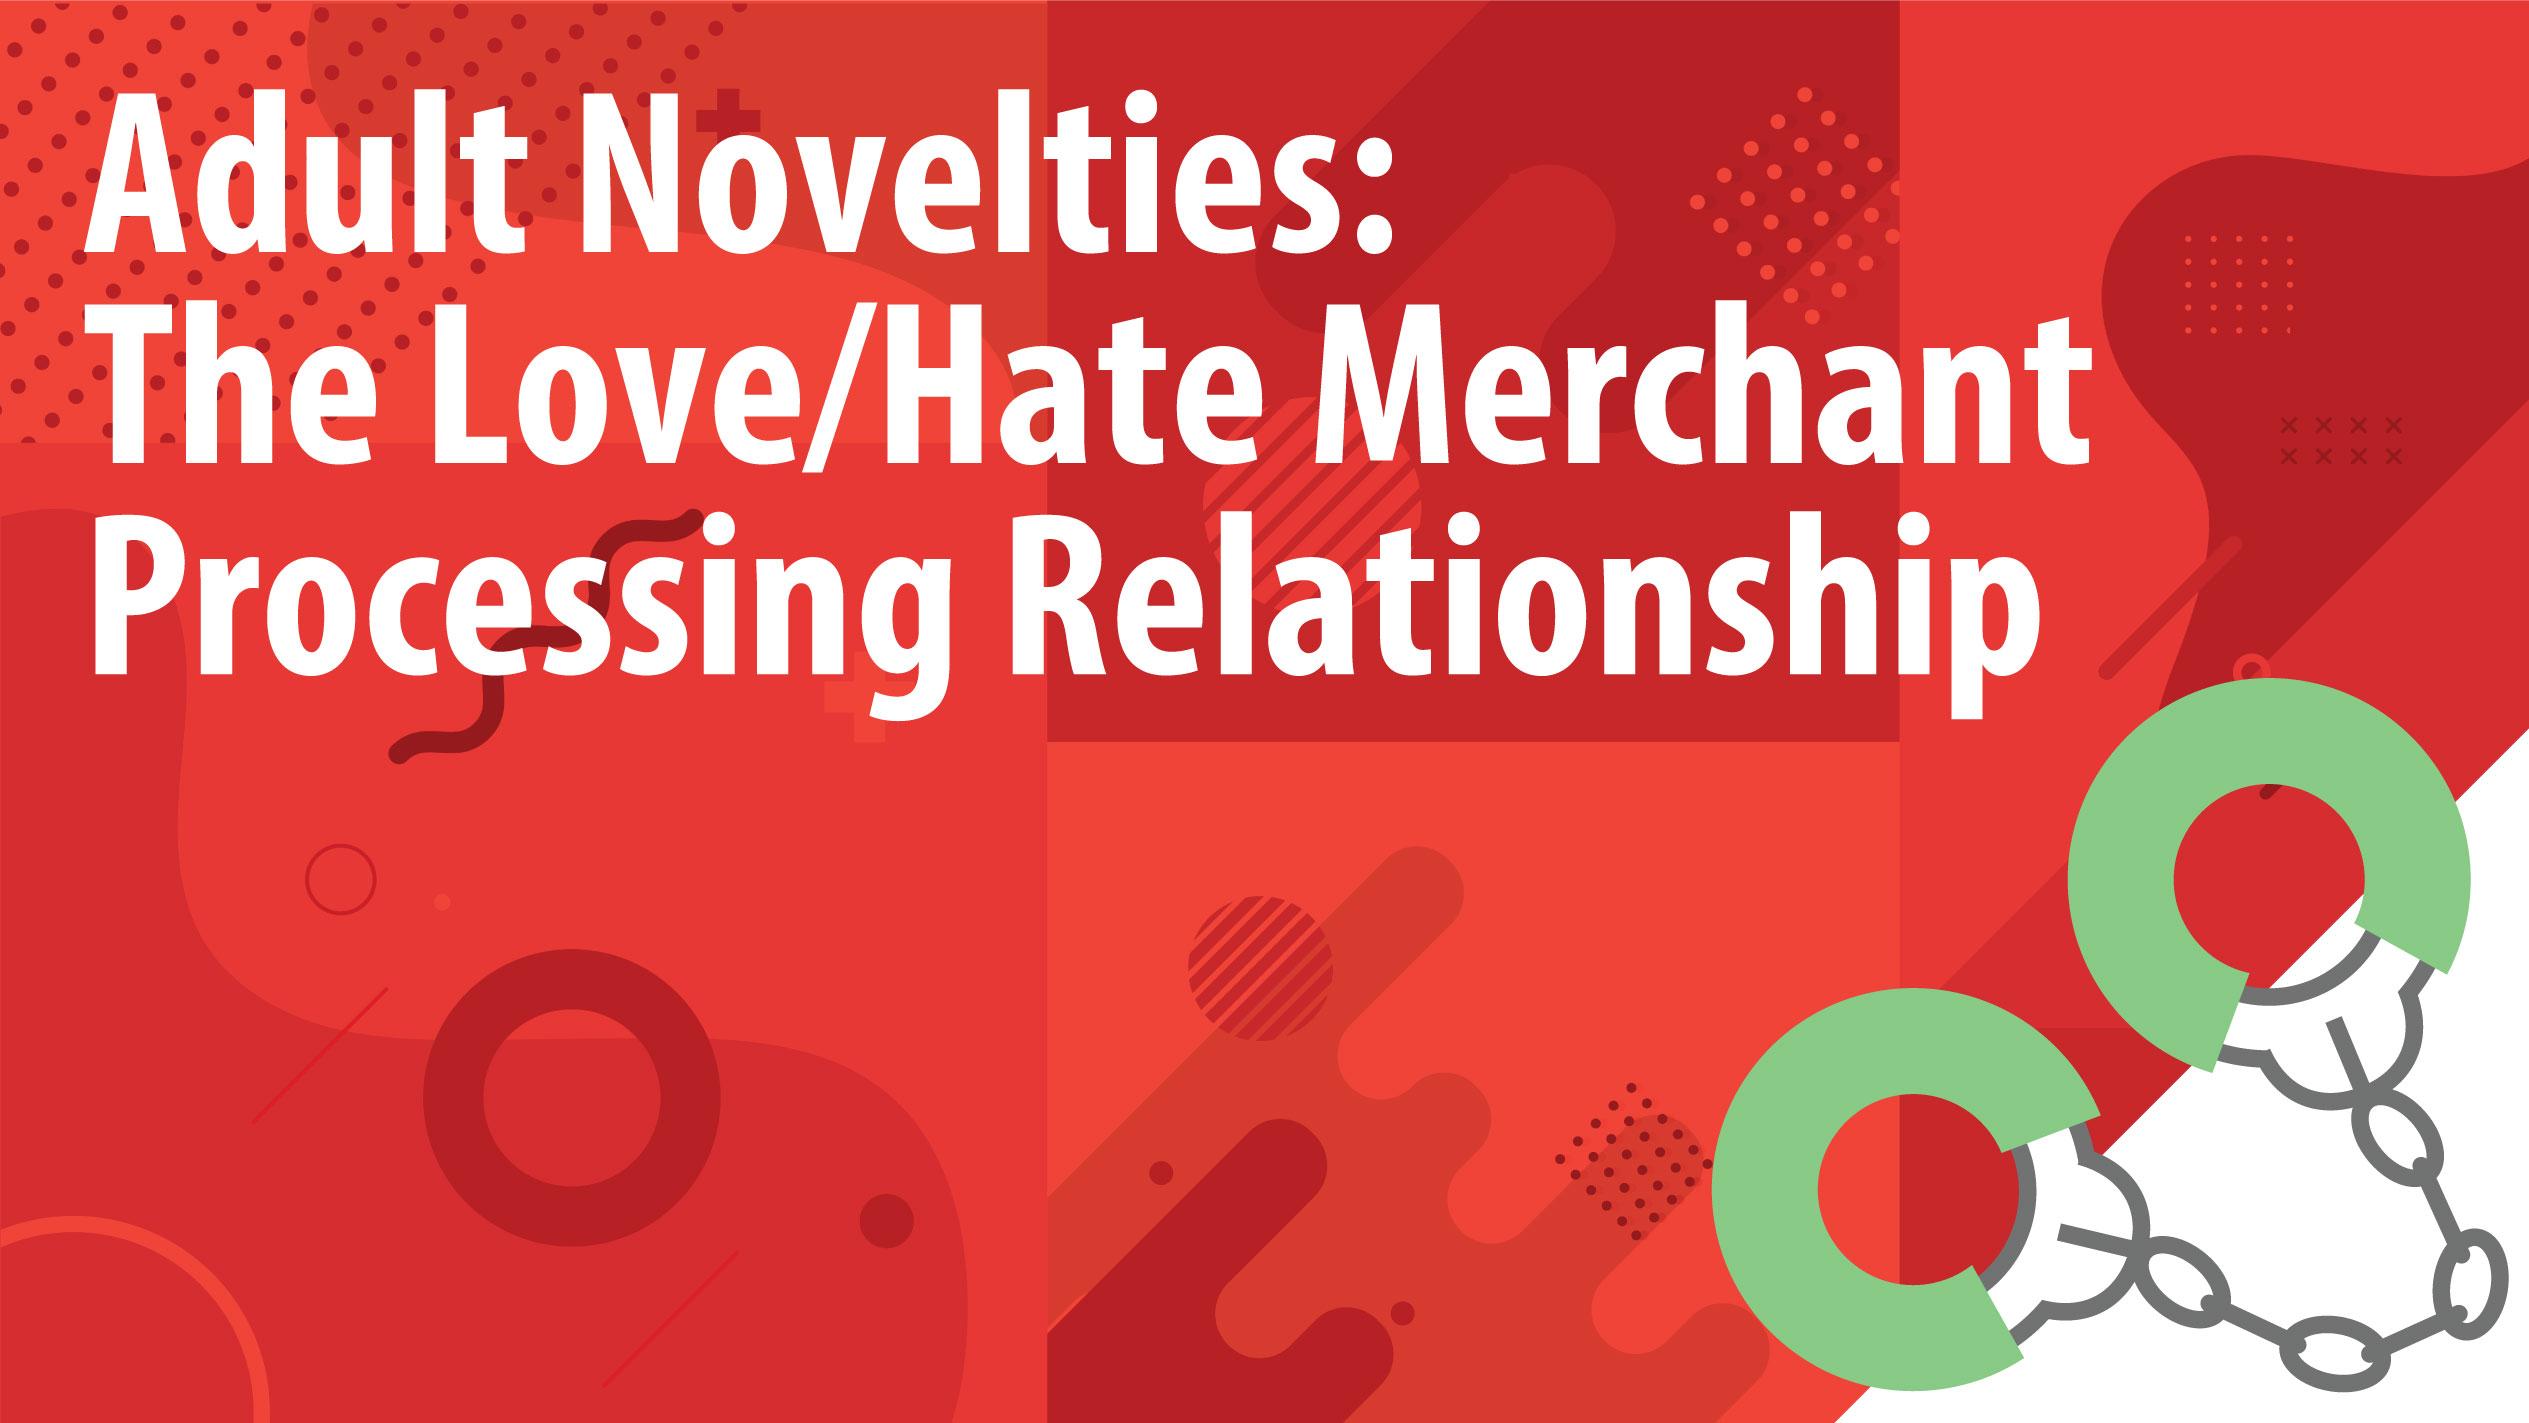 Adult Novelties: The Love/Hate Merchant Processing Relationship